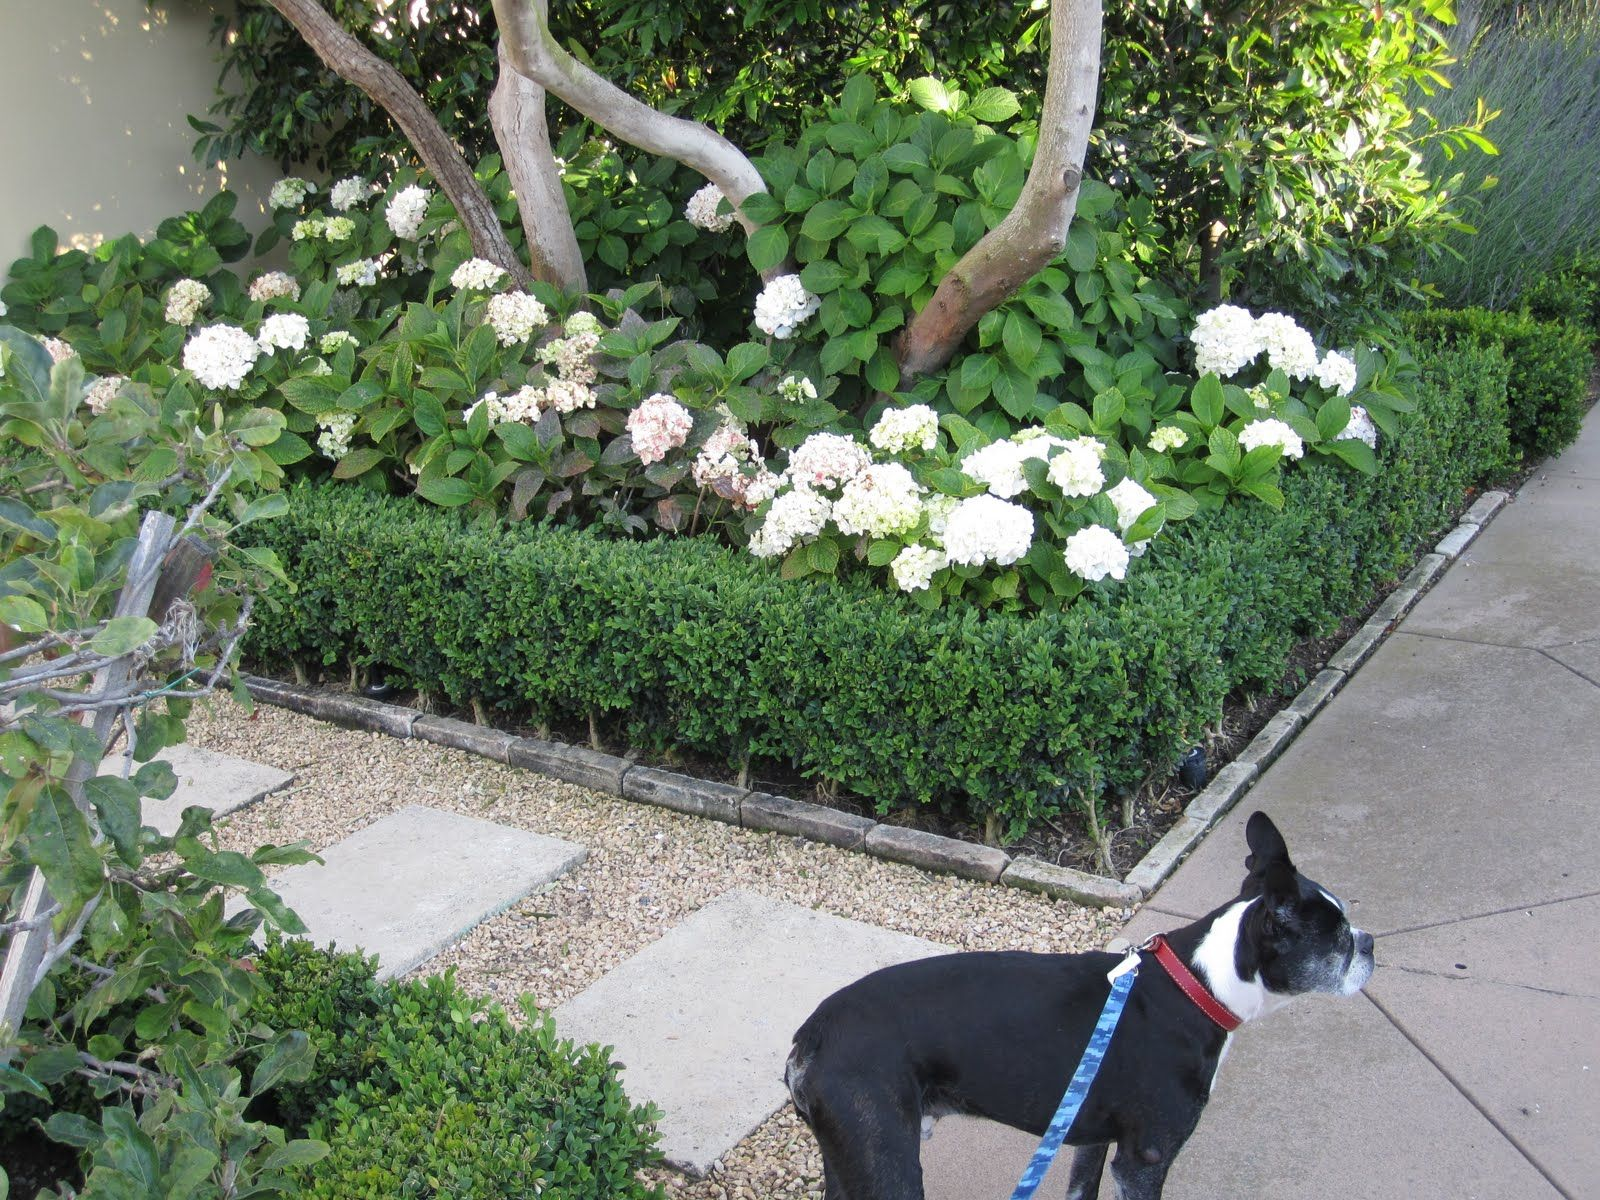 rectangle steppers recessed in gravel garden flowers shrubs